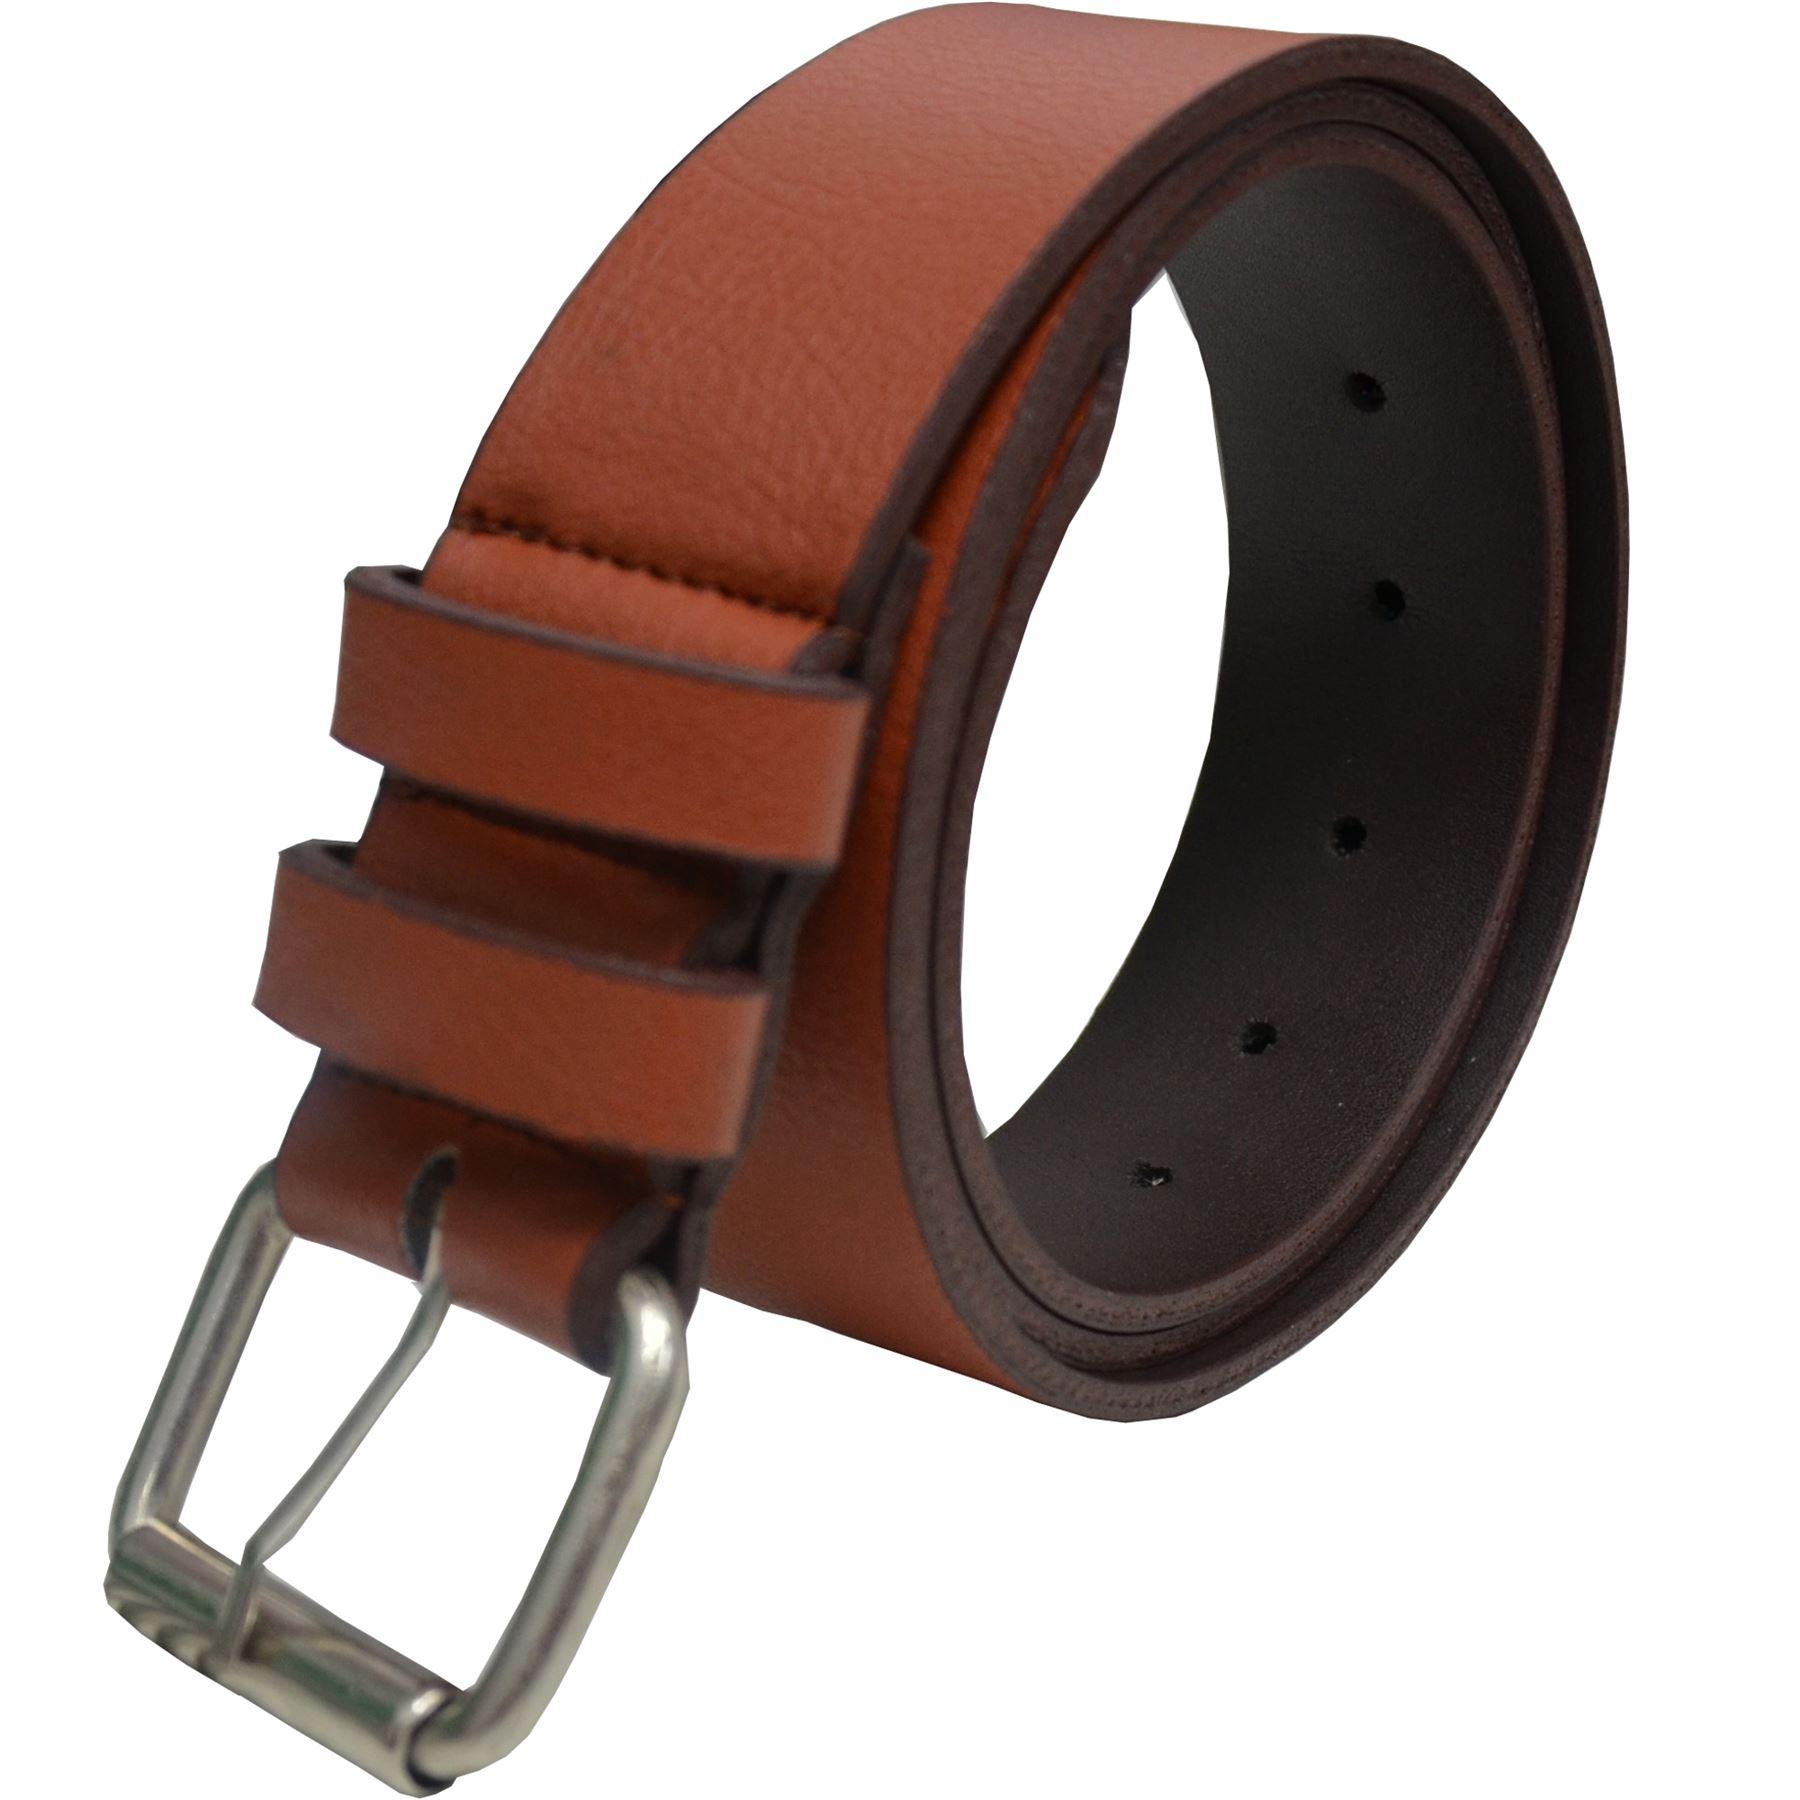 Eto Designer New Mens PU Leather Buckle Belt For Jeans Belts Big Tall King Sizes